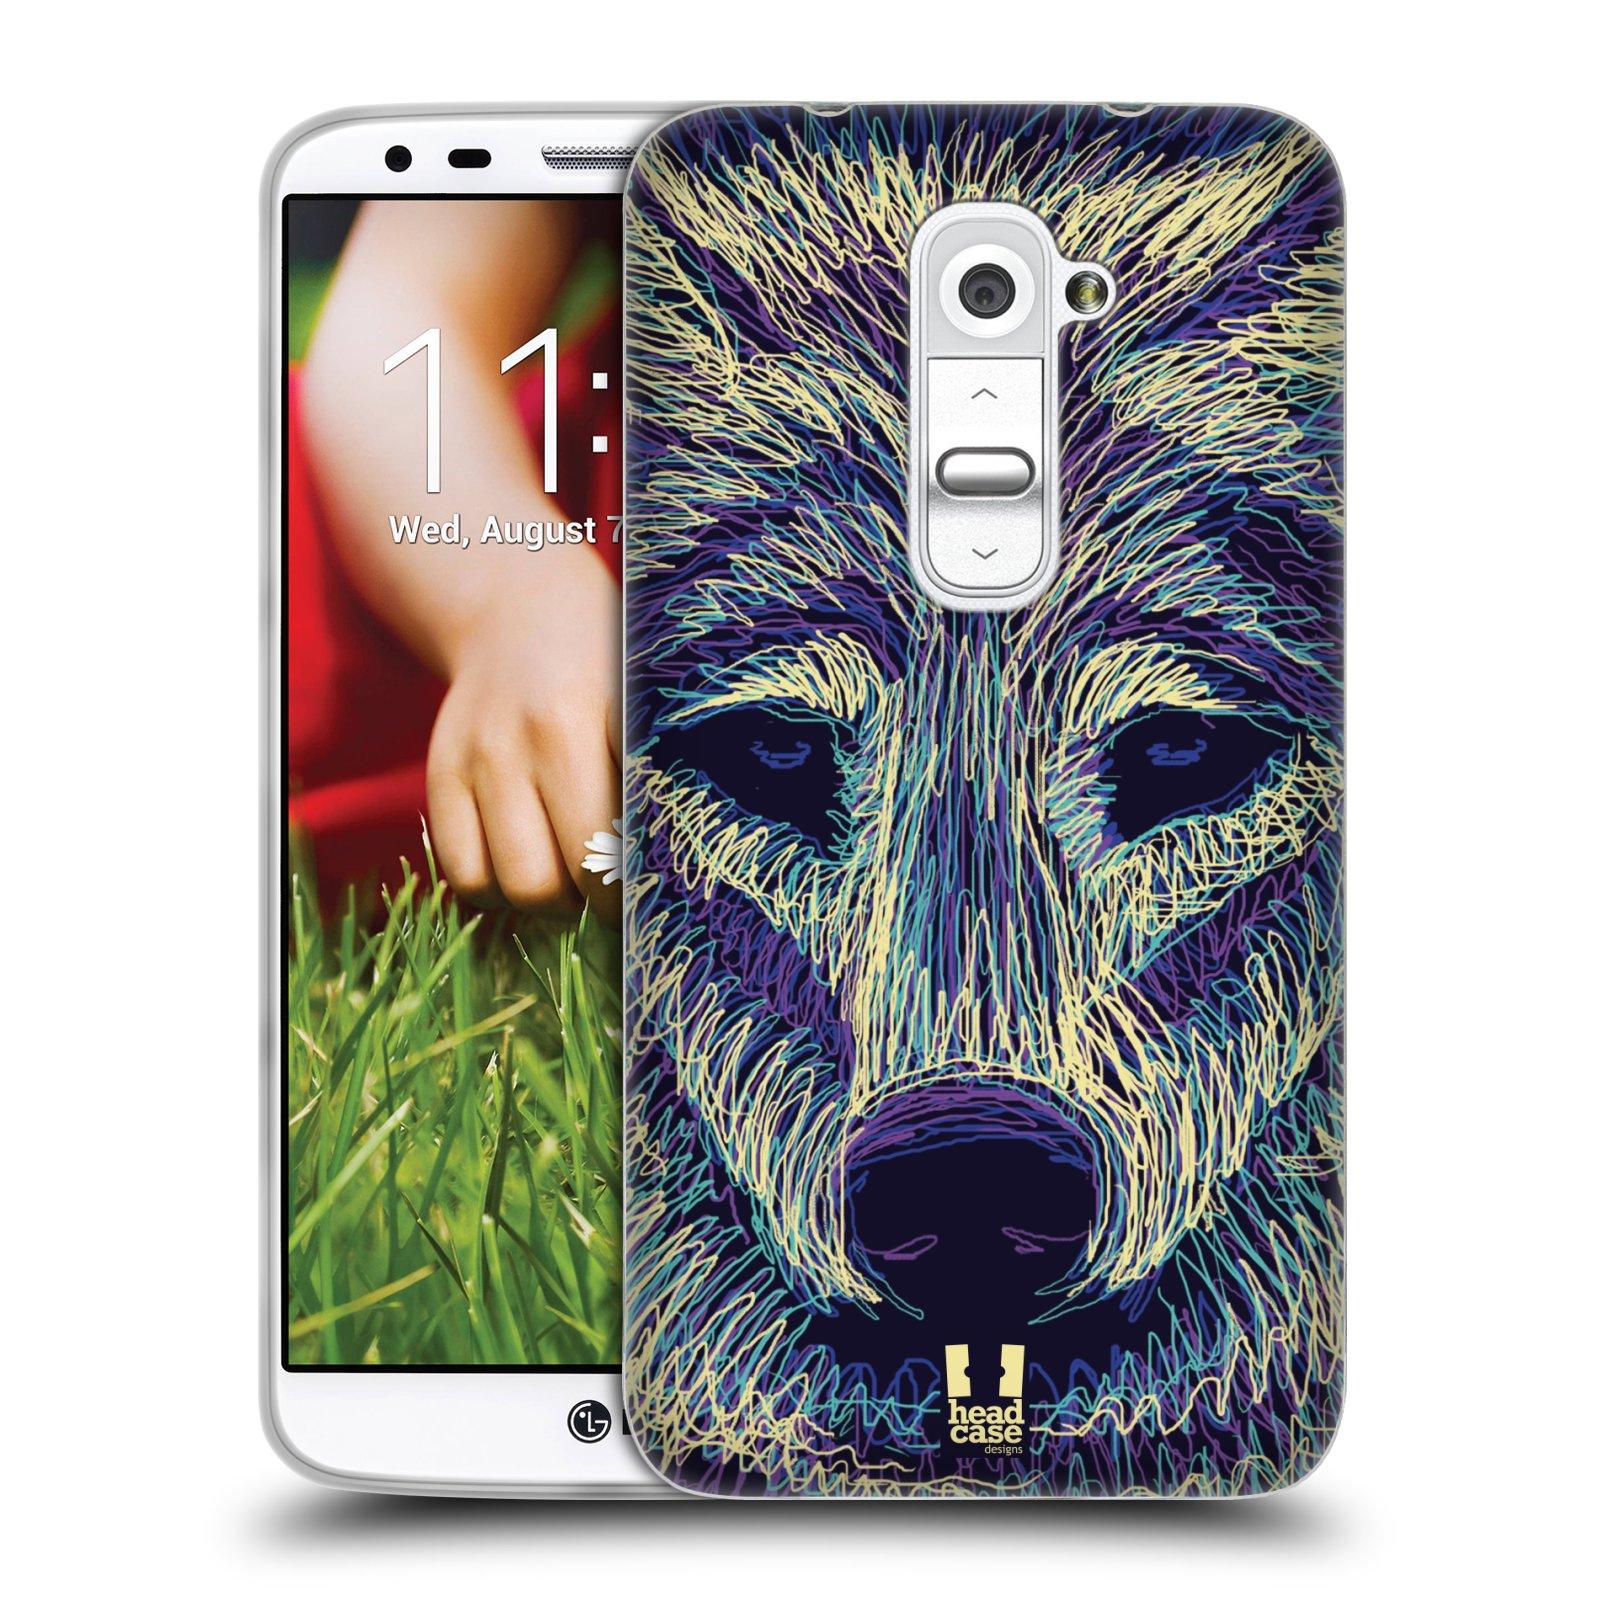 HEAD CASE silikonový obal na mobil LG G2 vzor zvíře čmáranice vlk